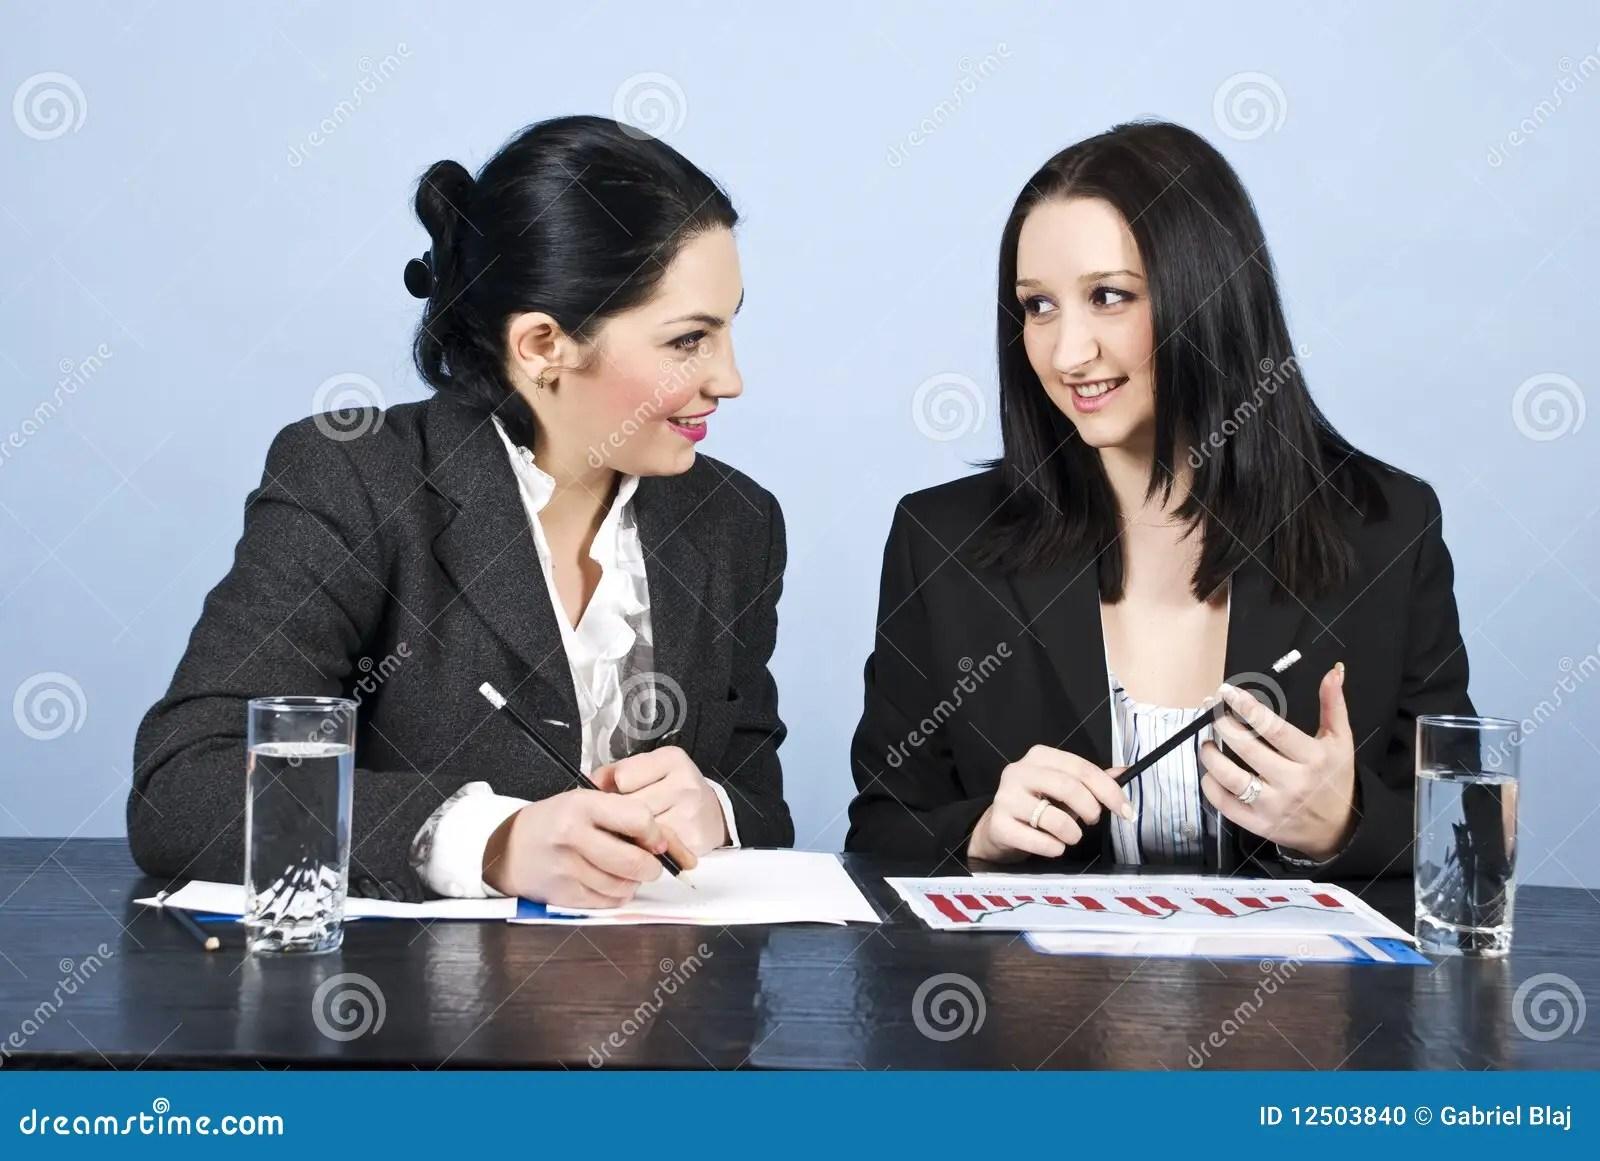 Business Women Conversation At Meeting Stock Photo